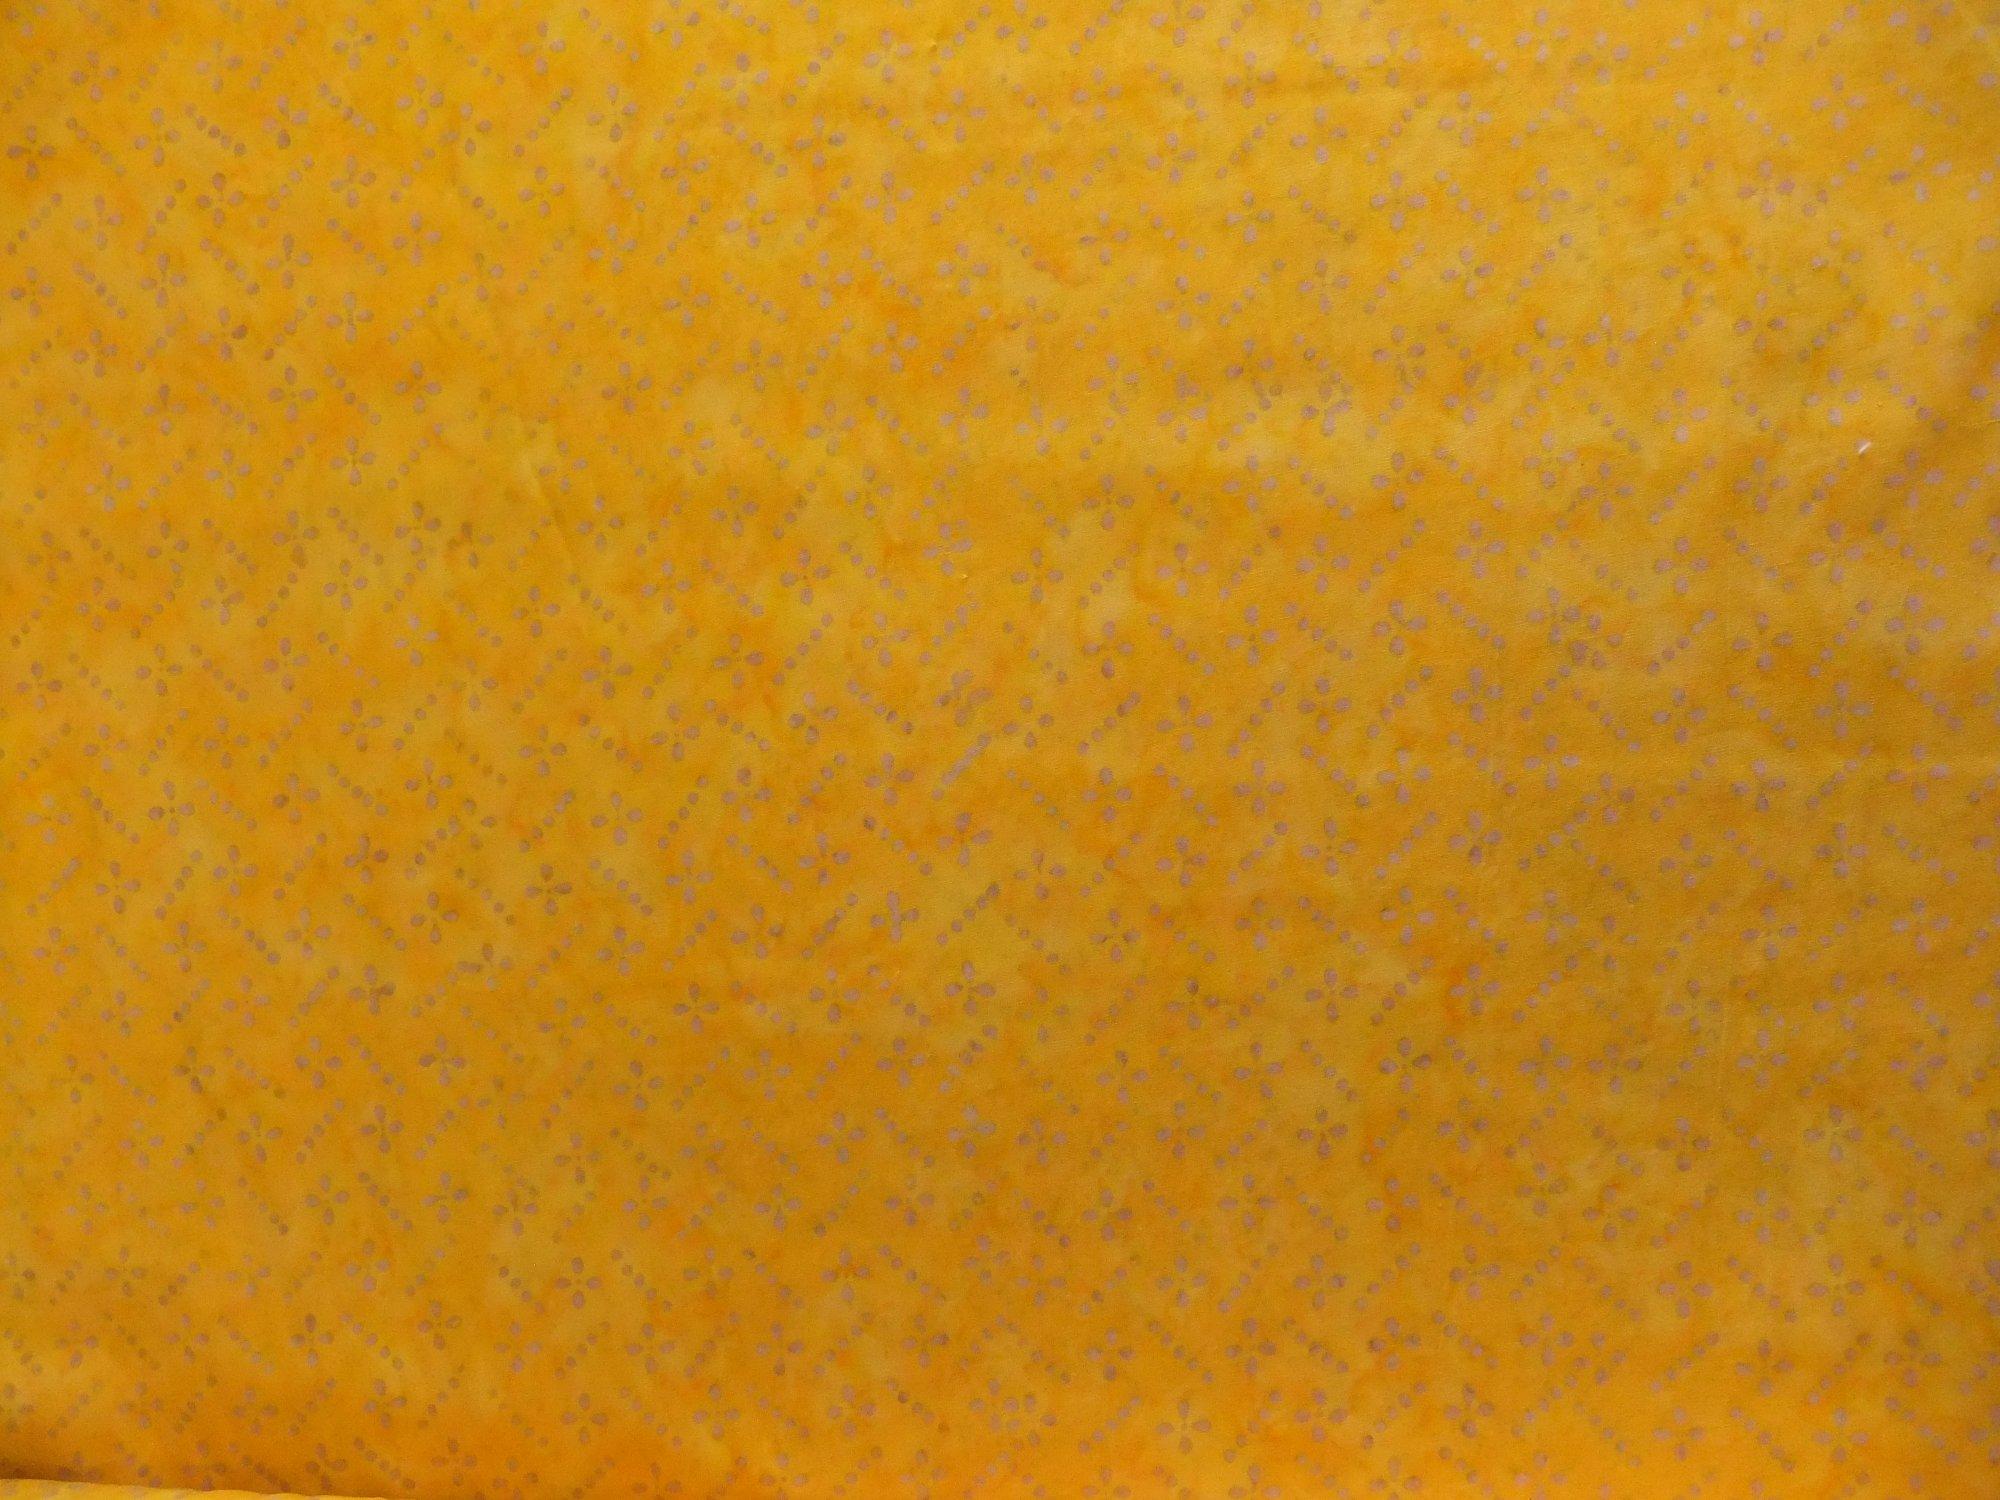 batik tonga nectar - Foust Textiles - B1831